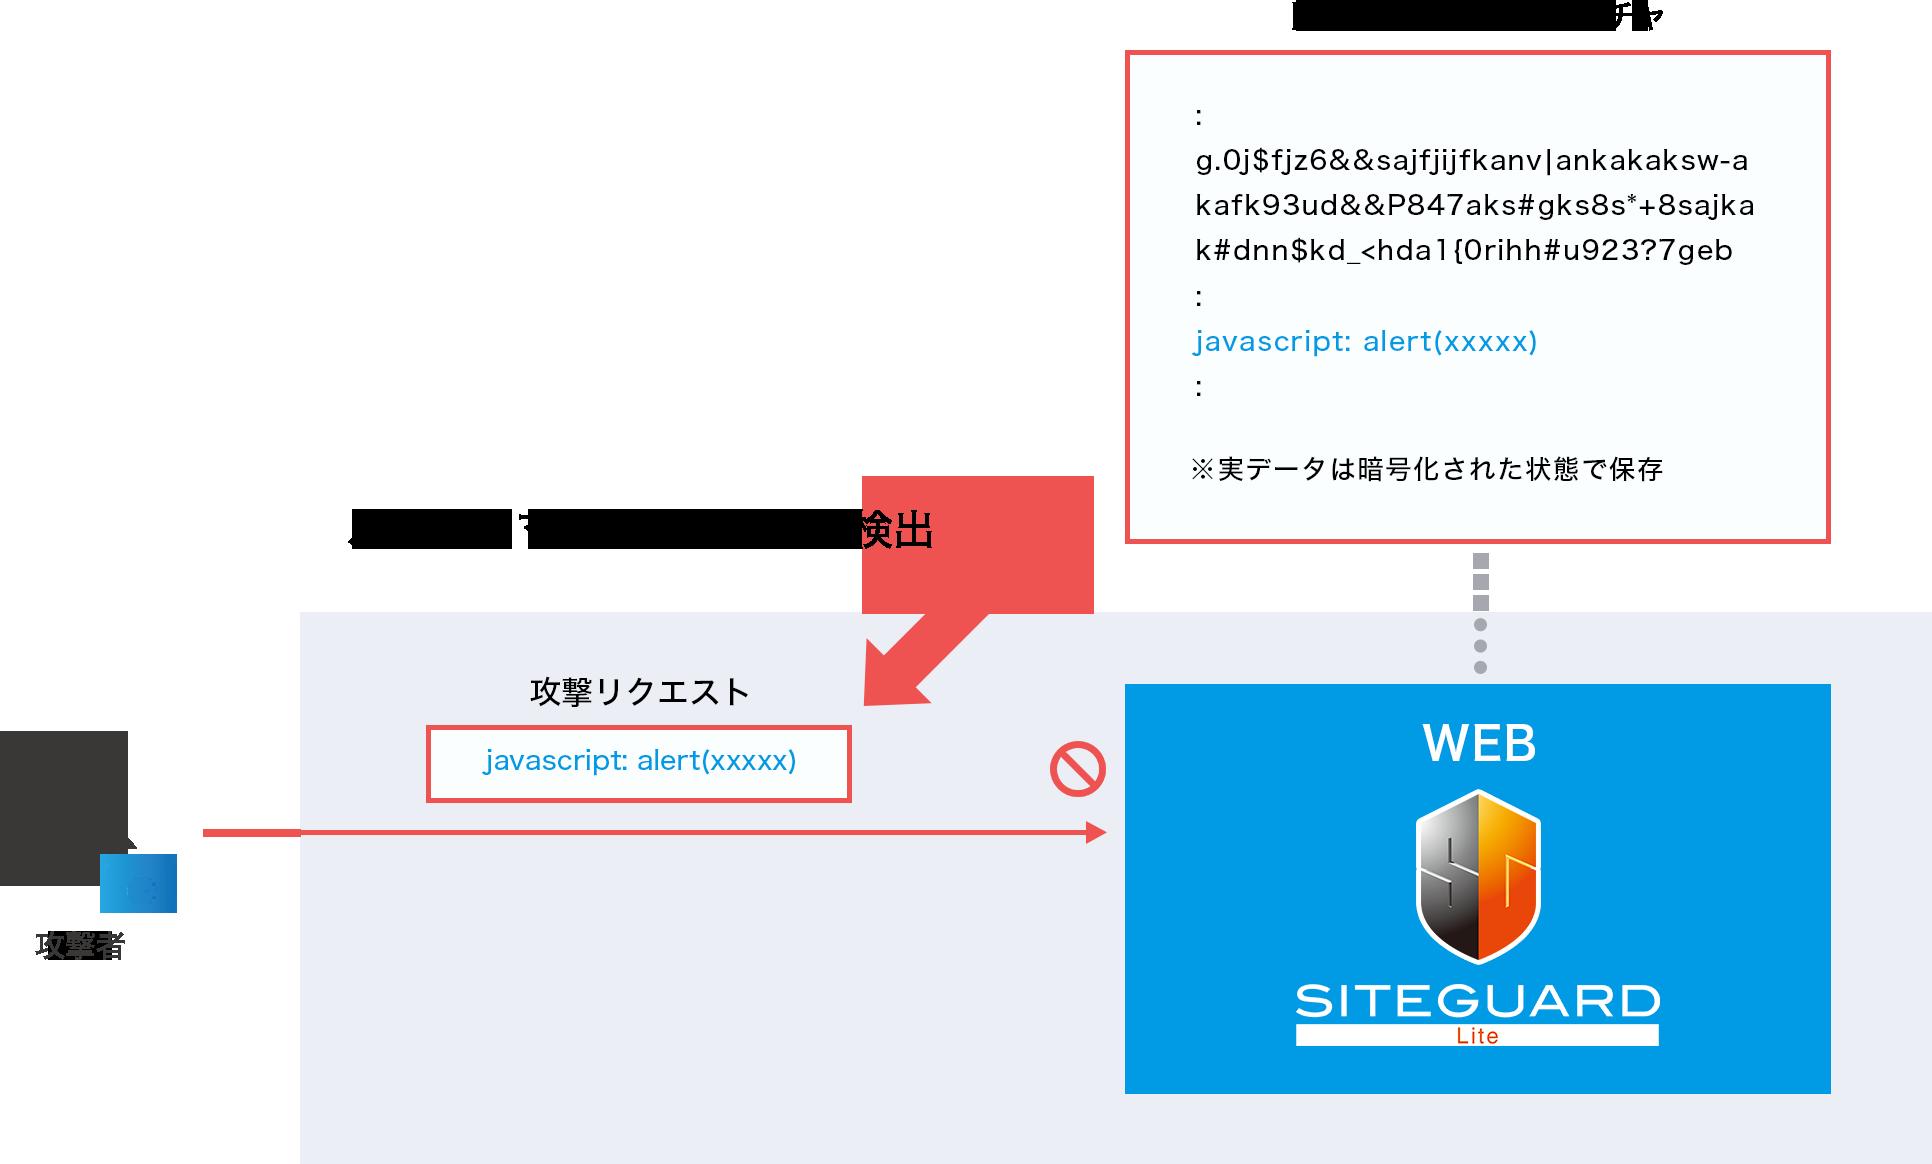 SiteGuard Liteのシグネチャ検査